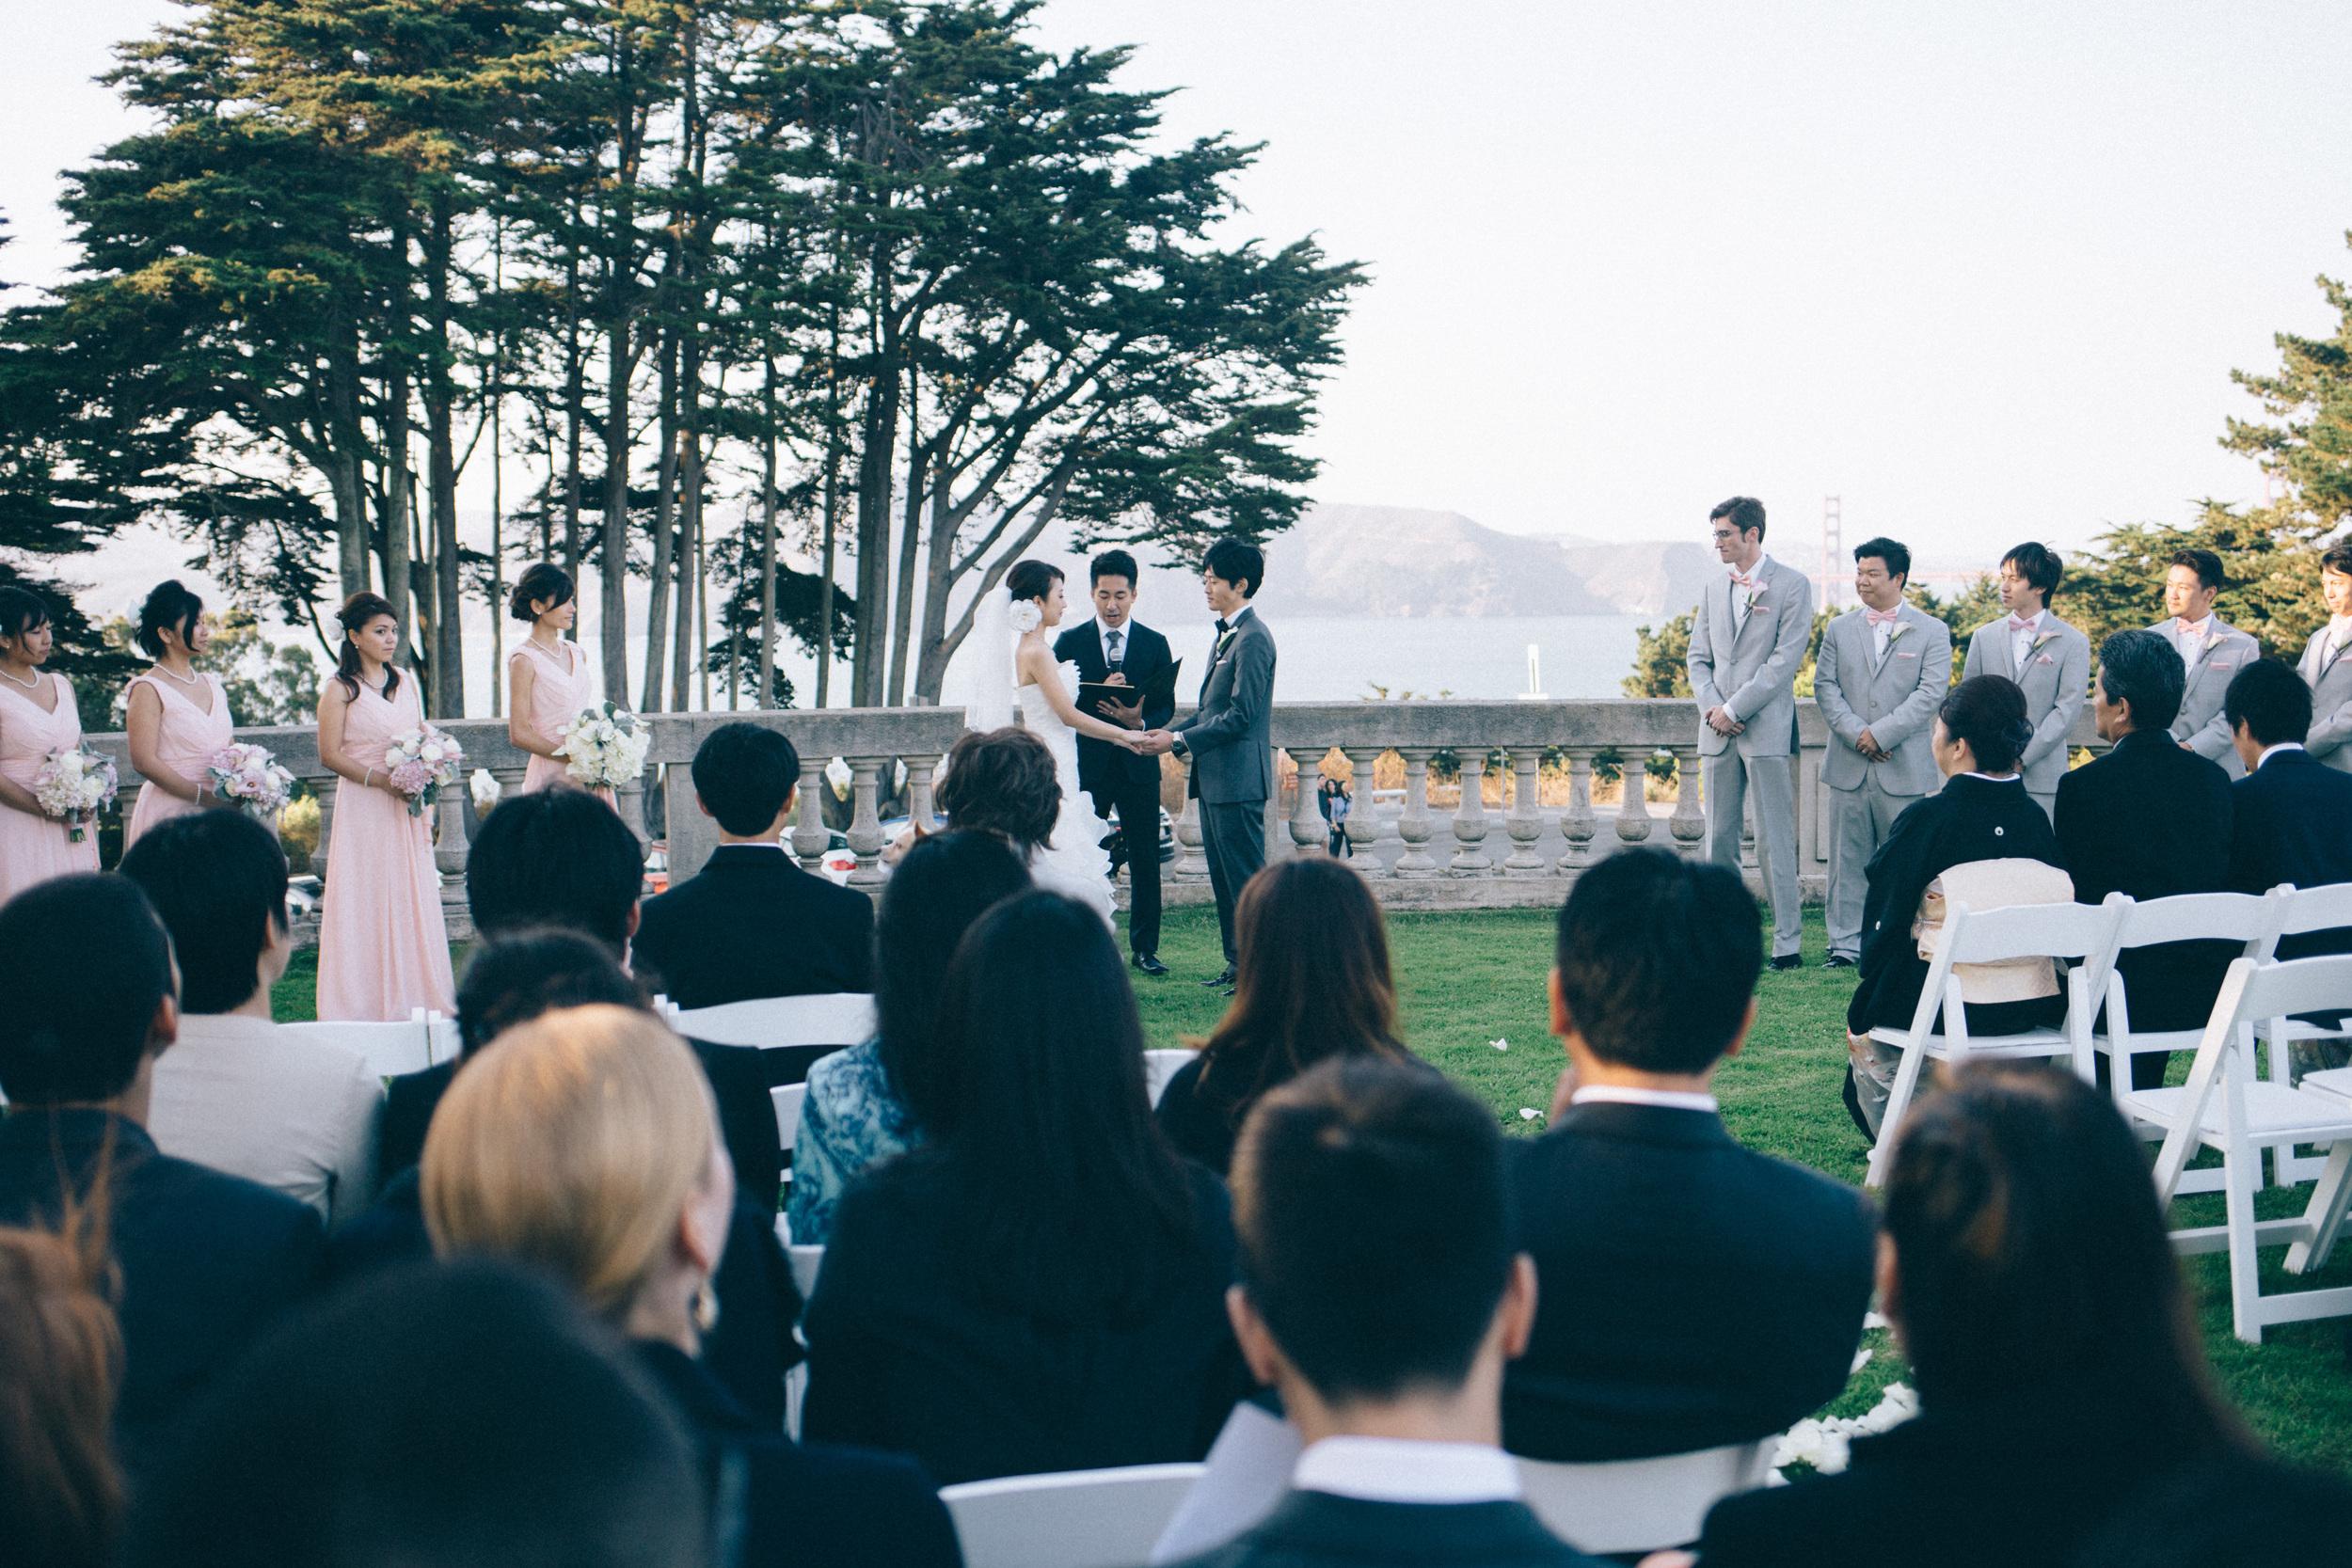 Outdoor wedding ceremony at Legion of Honor in San Francisco, California